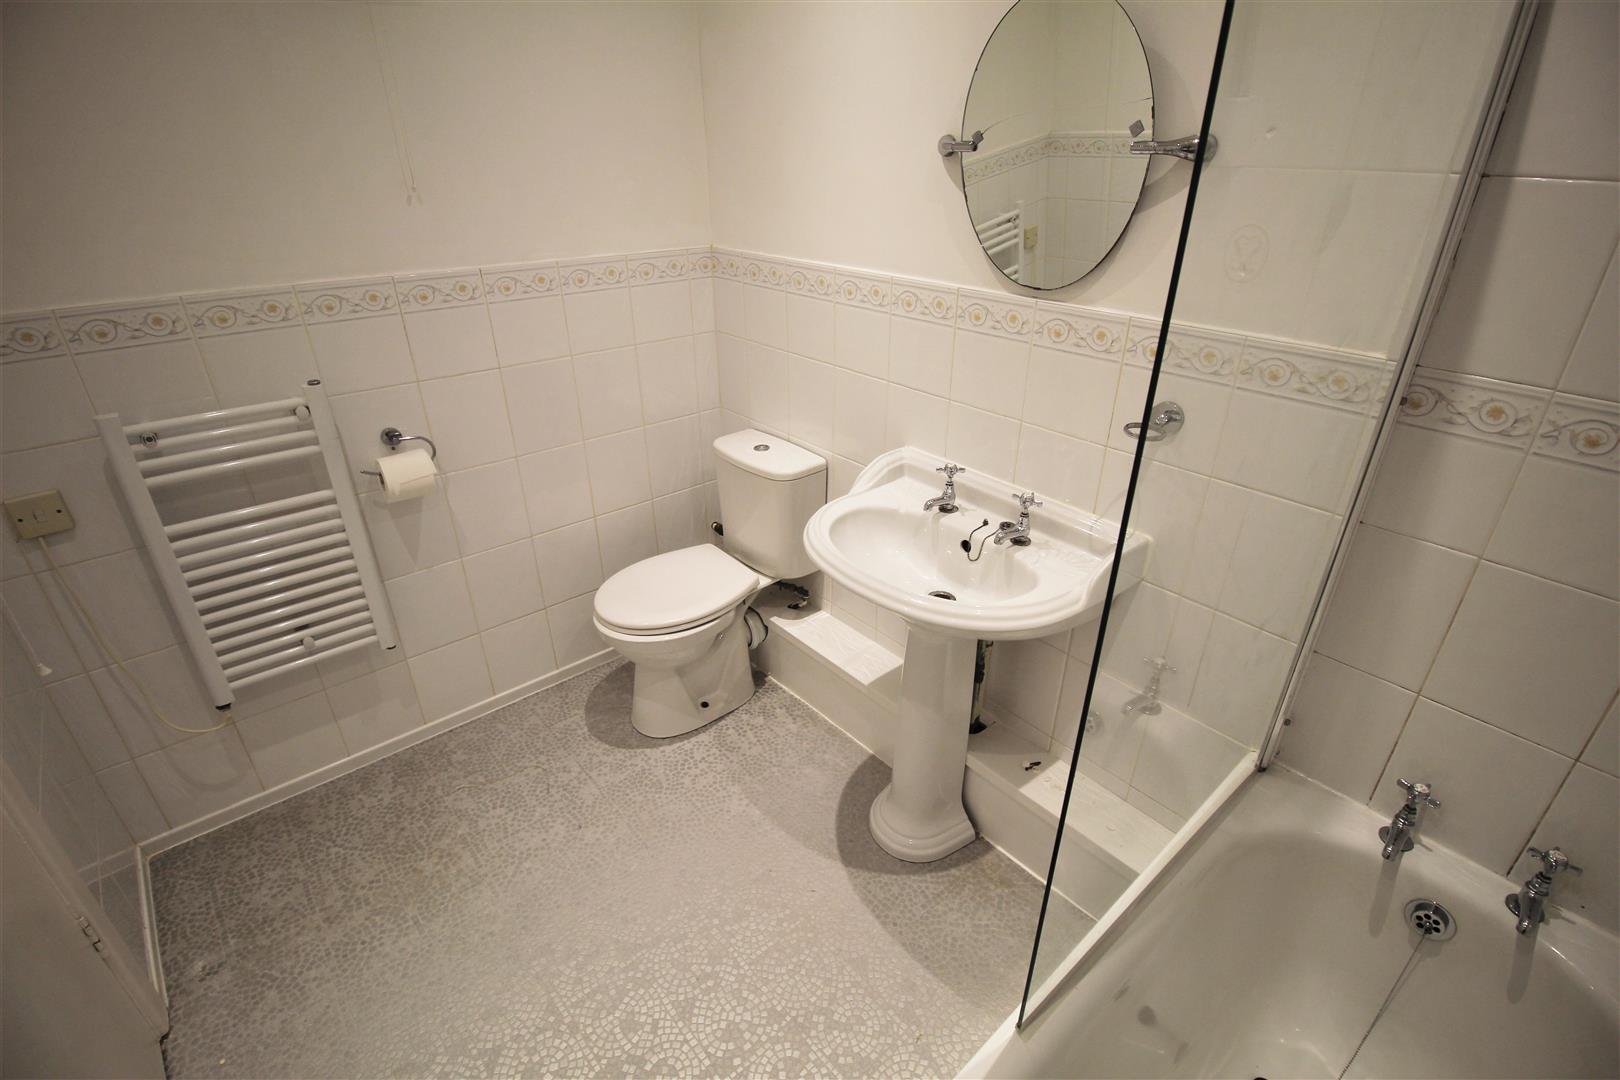 2 Bedrooms, Flat, Rice Lane, Liverpool